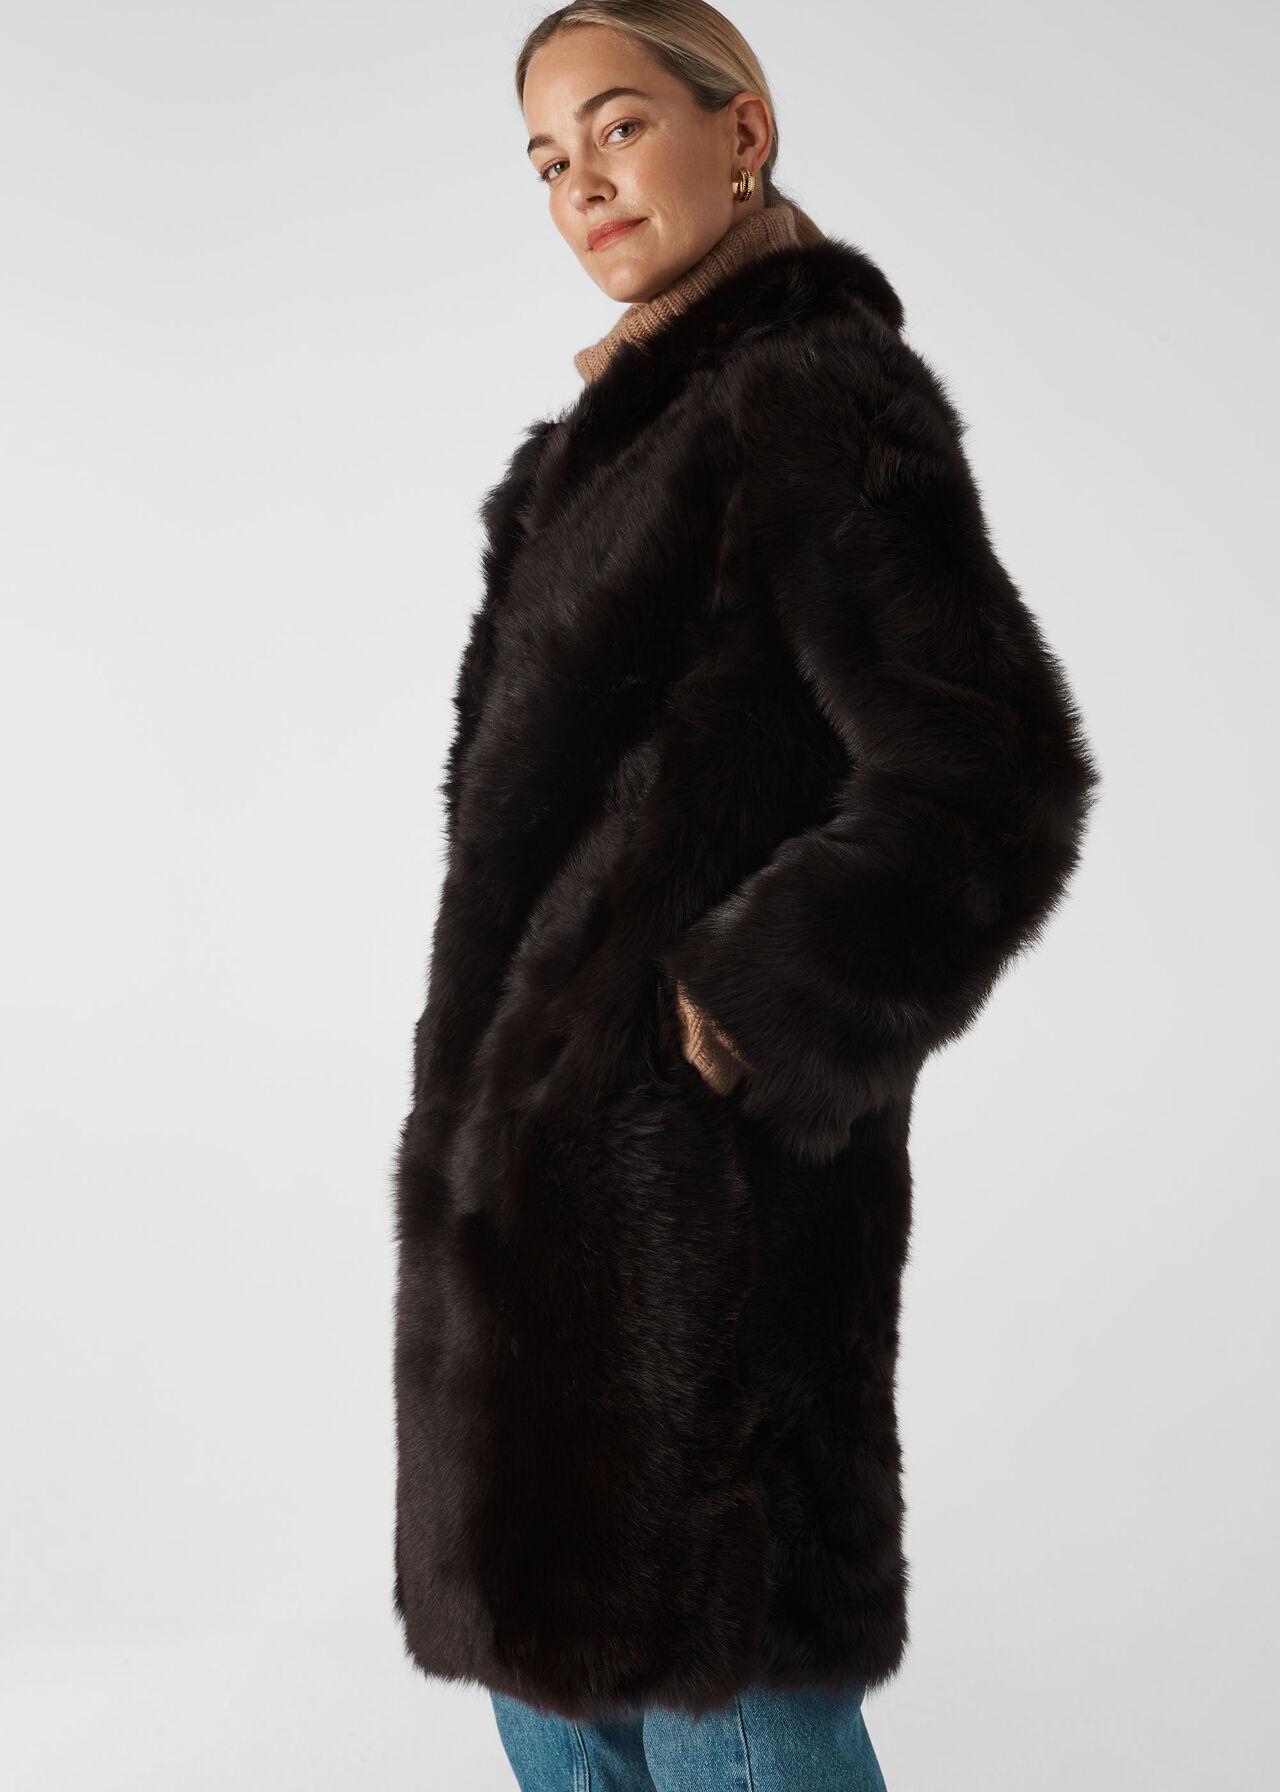 Sienna Sheepskin Coat Chocolate